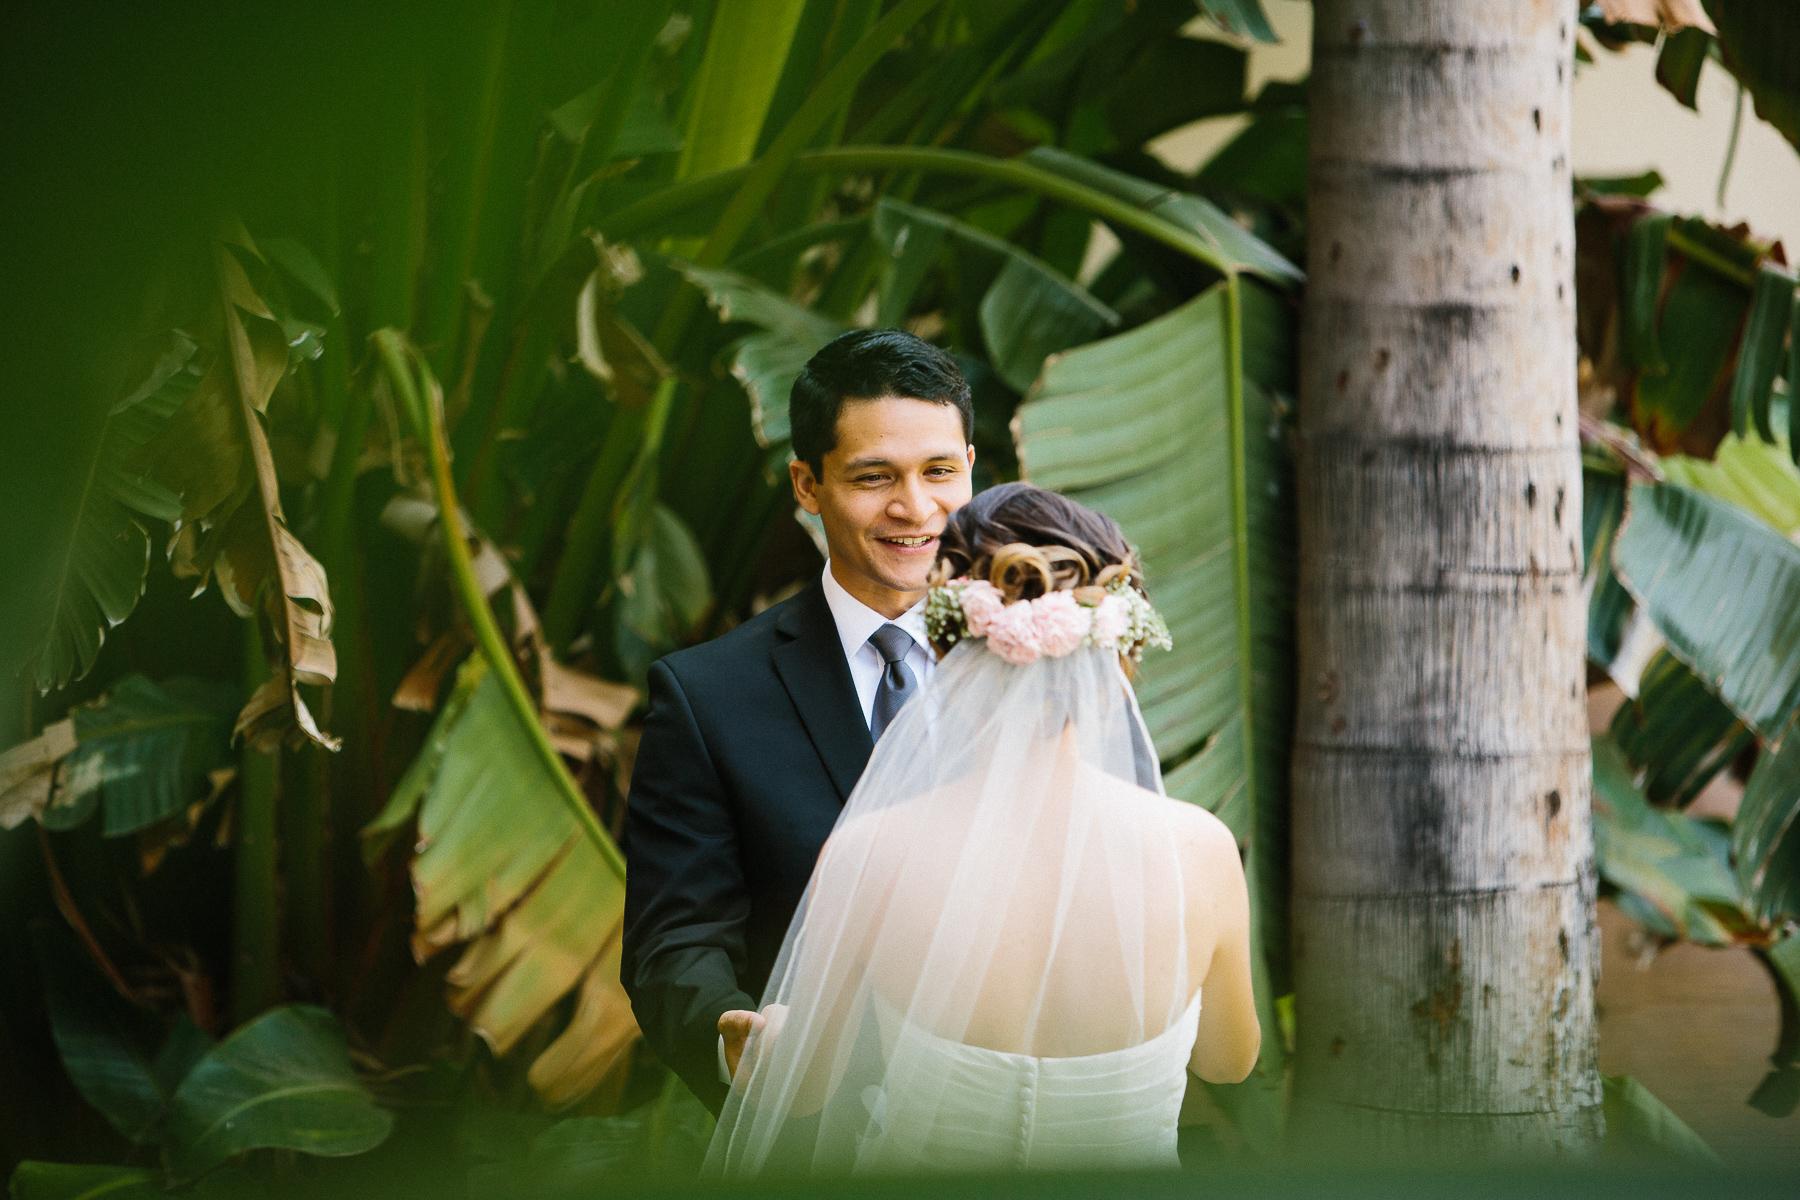 170708-Luxium-Weddings-Arizona-Sheraton-Phoenix-Arizona-Photographer-Hilton-Hawaiian-1008.jpg